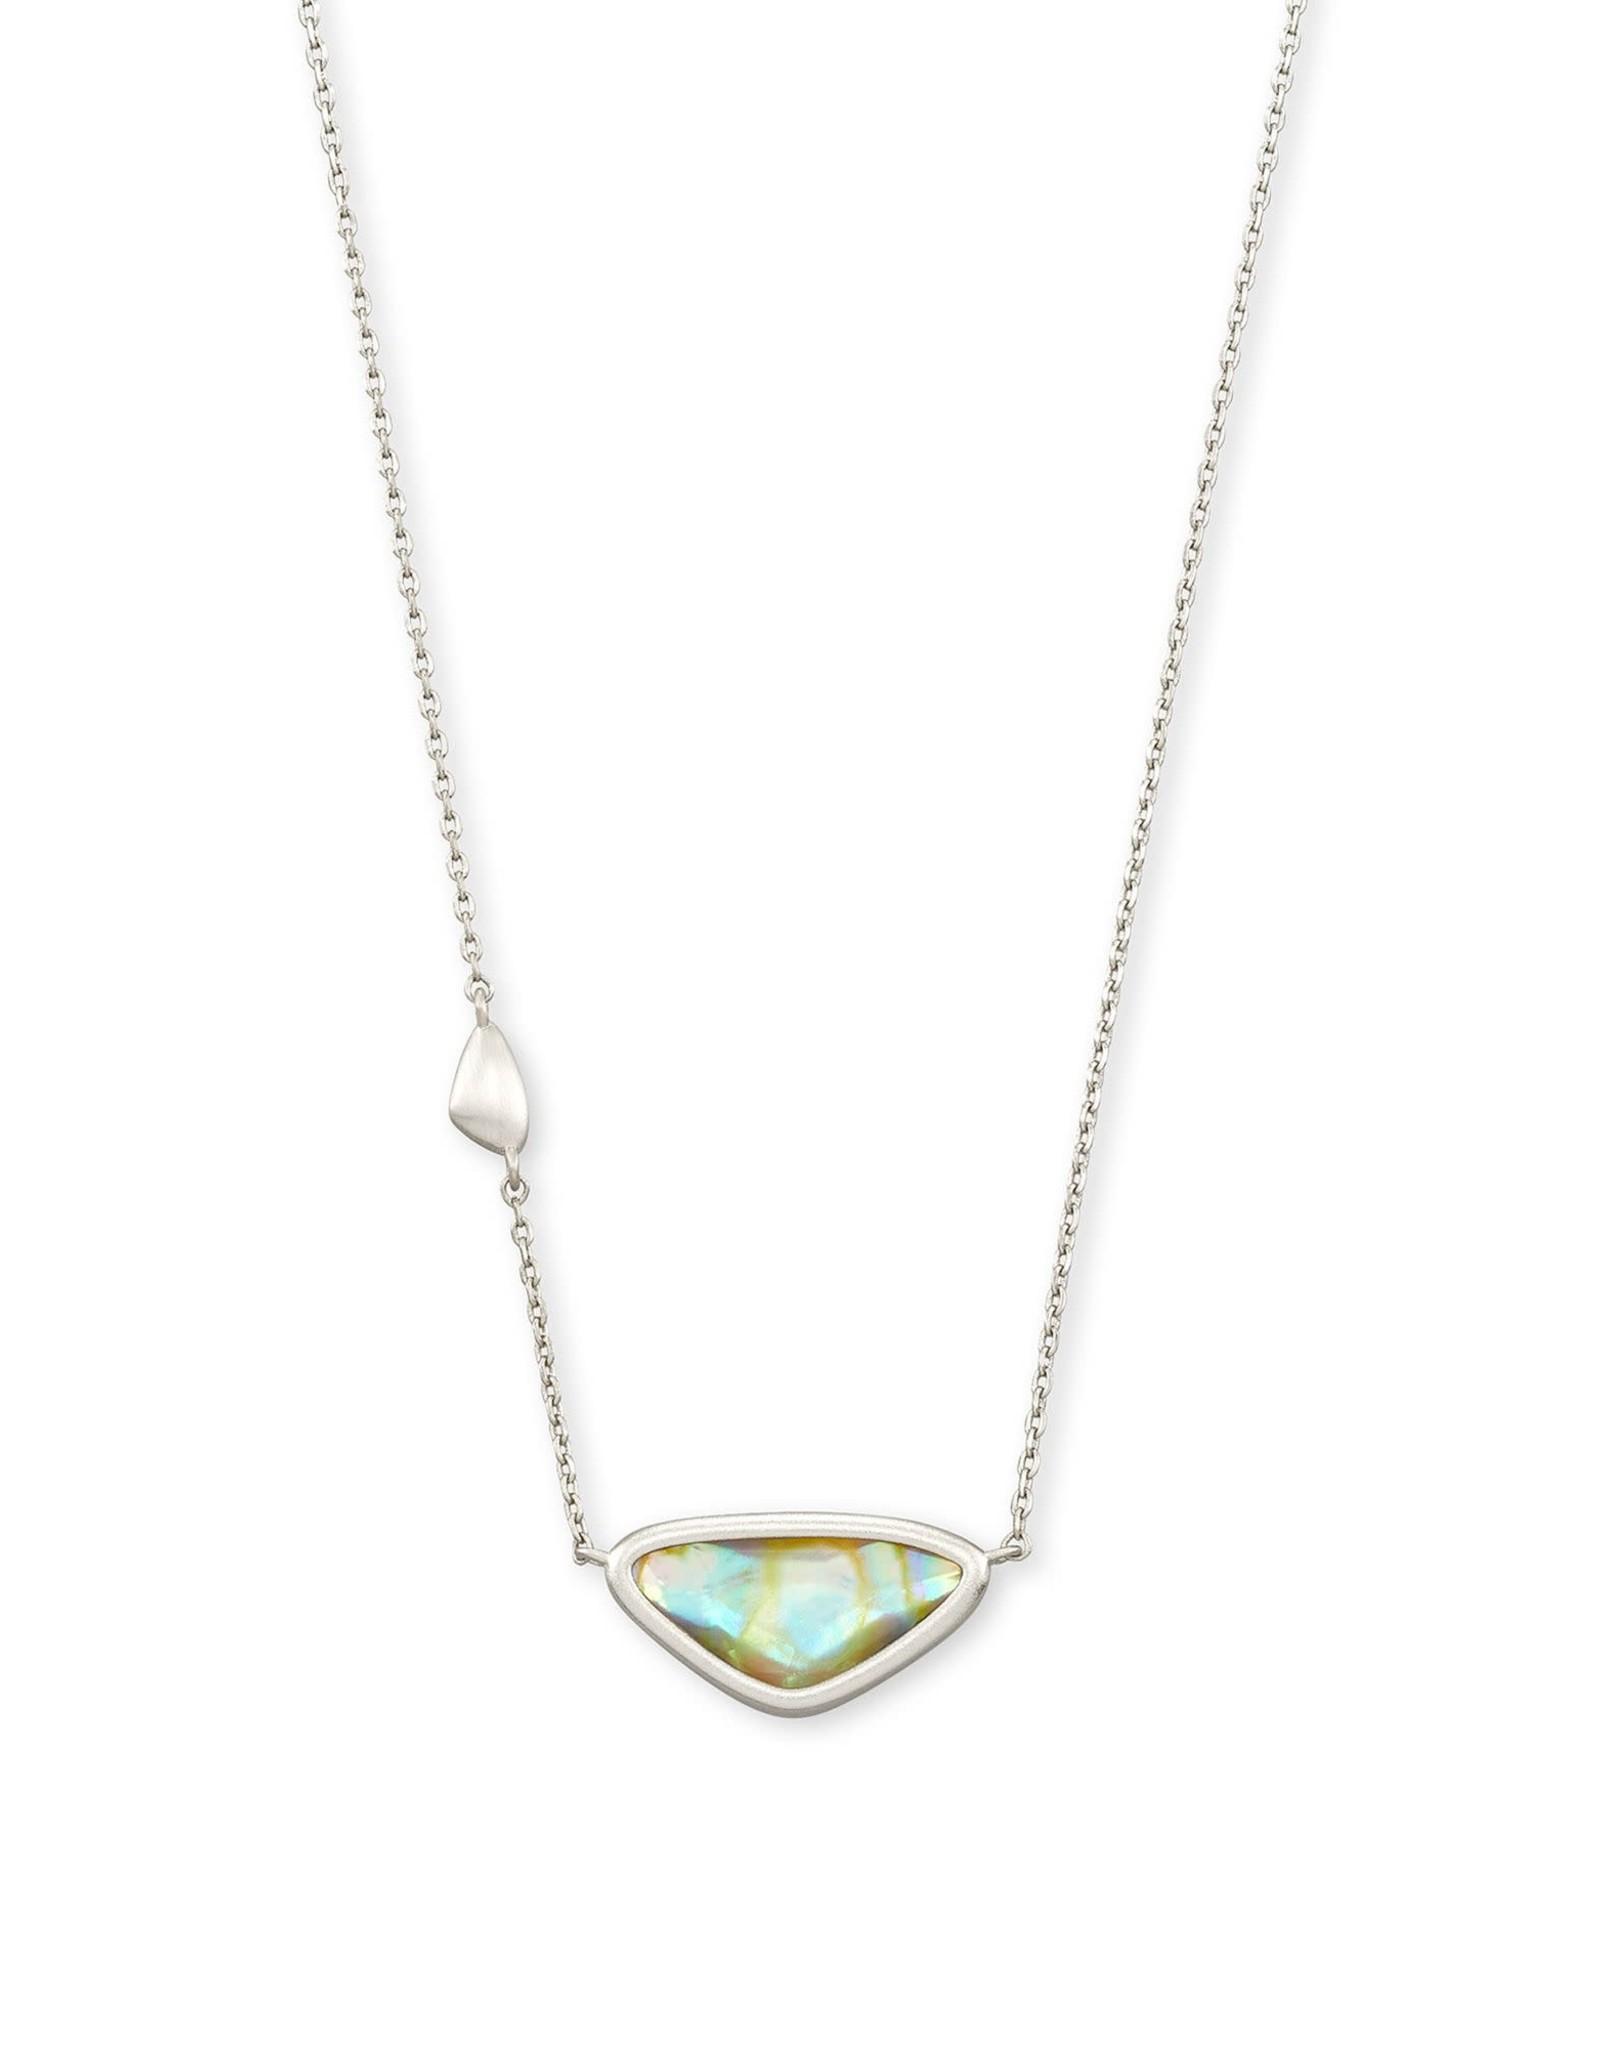 Kendra Scott Margot Pendant Necklace - Iridescent Abalone/Rhodium